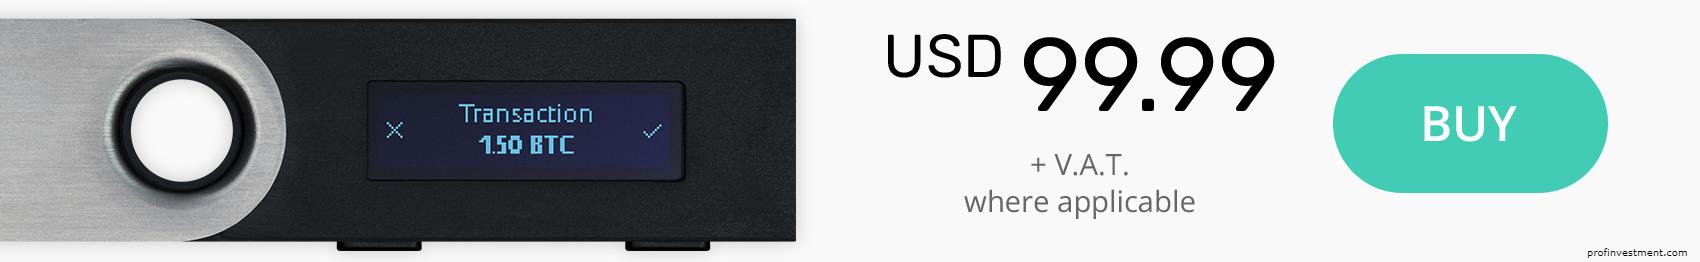 аппаратный кошелек для криптовалюты ledger